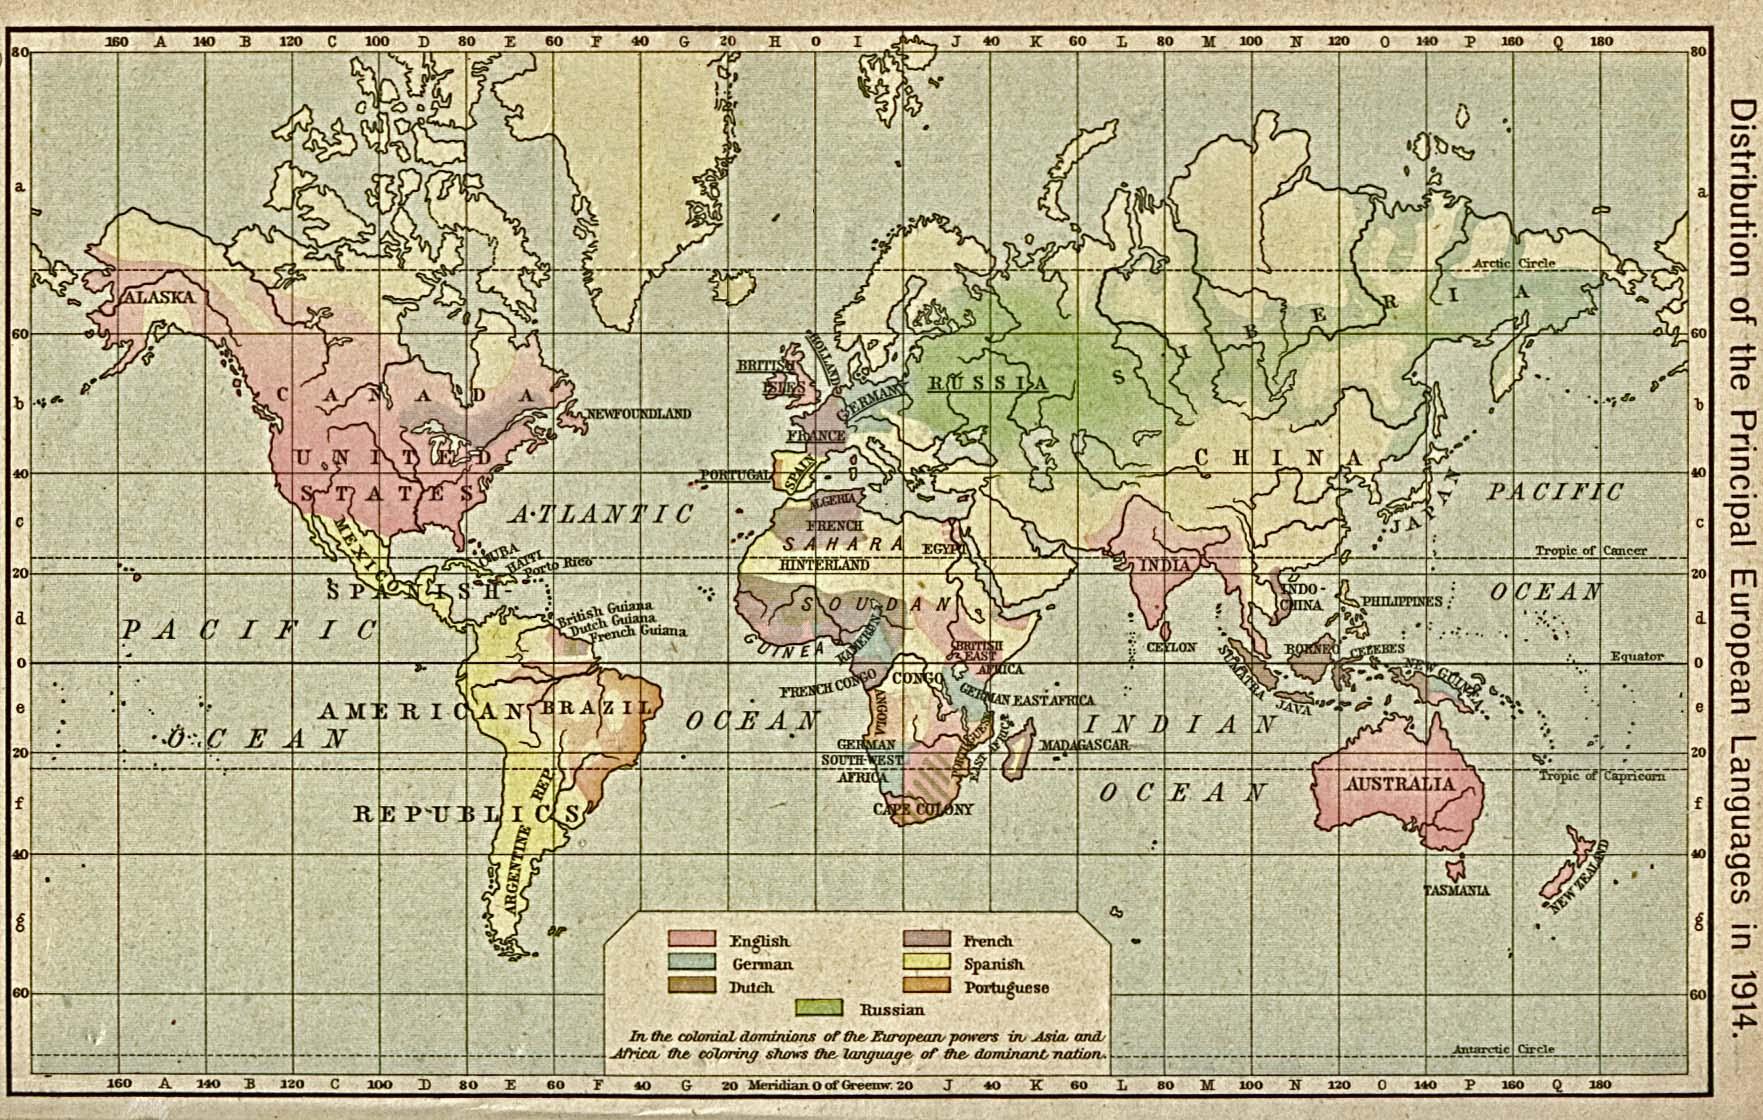 Wwwclemitsoncouk - Old world language families map